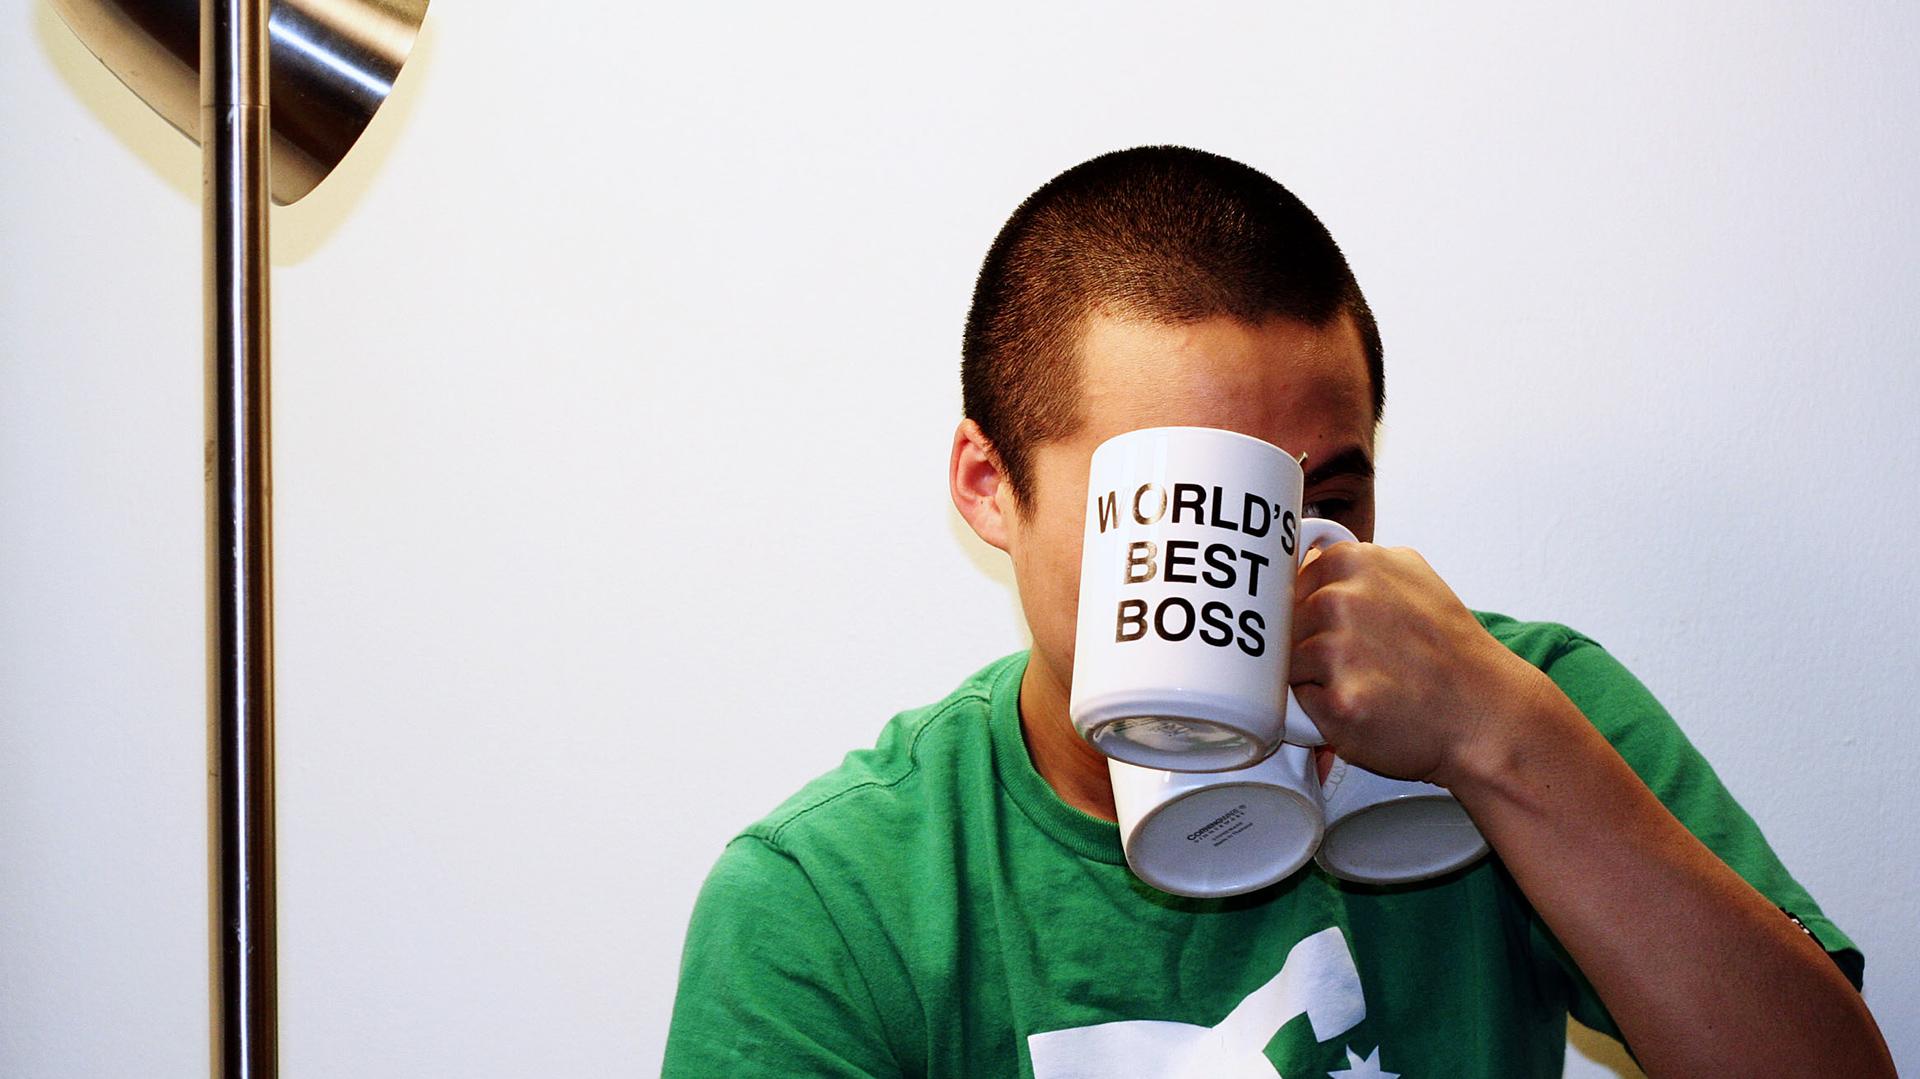 qualities good supervisor  5 qualities good supervisor